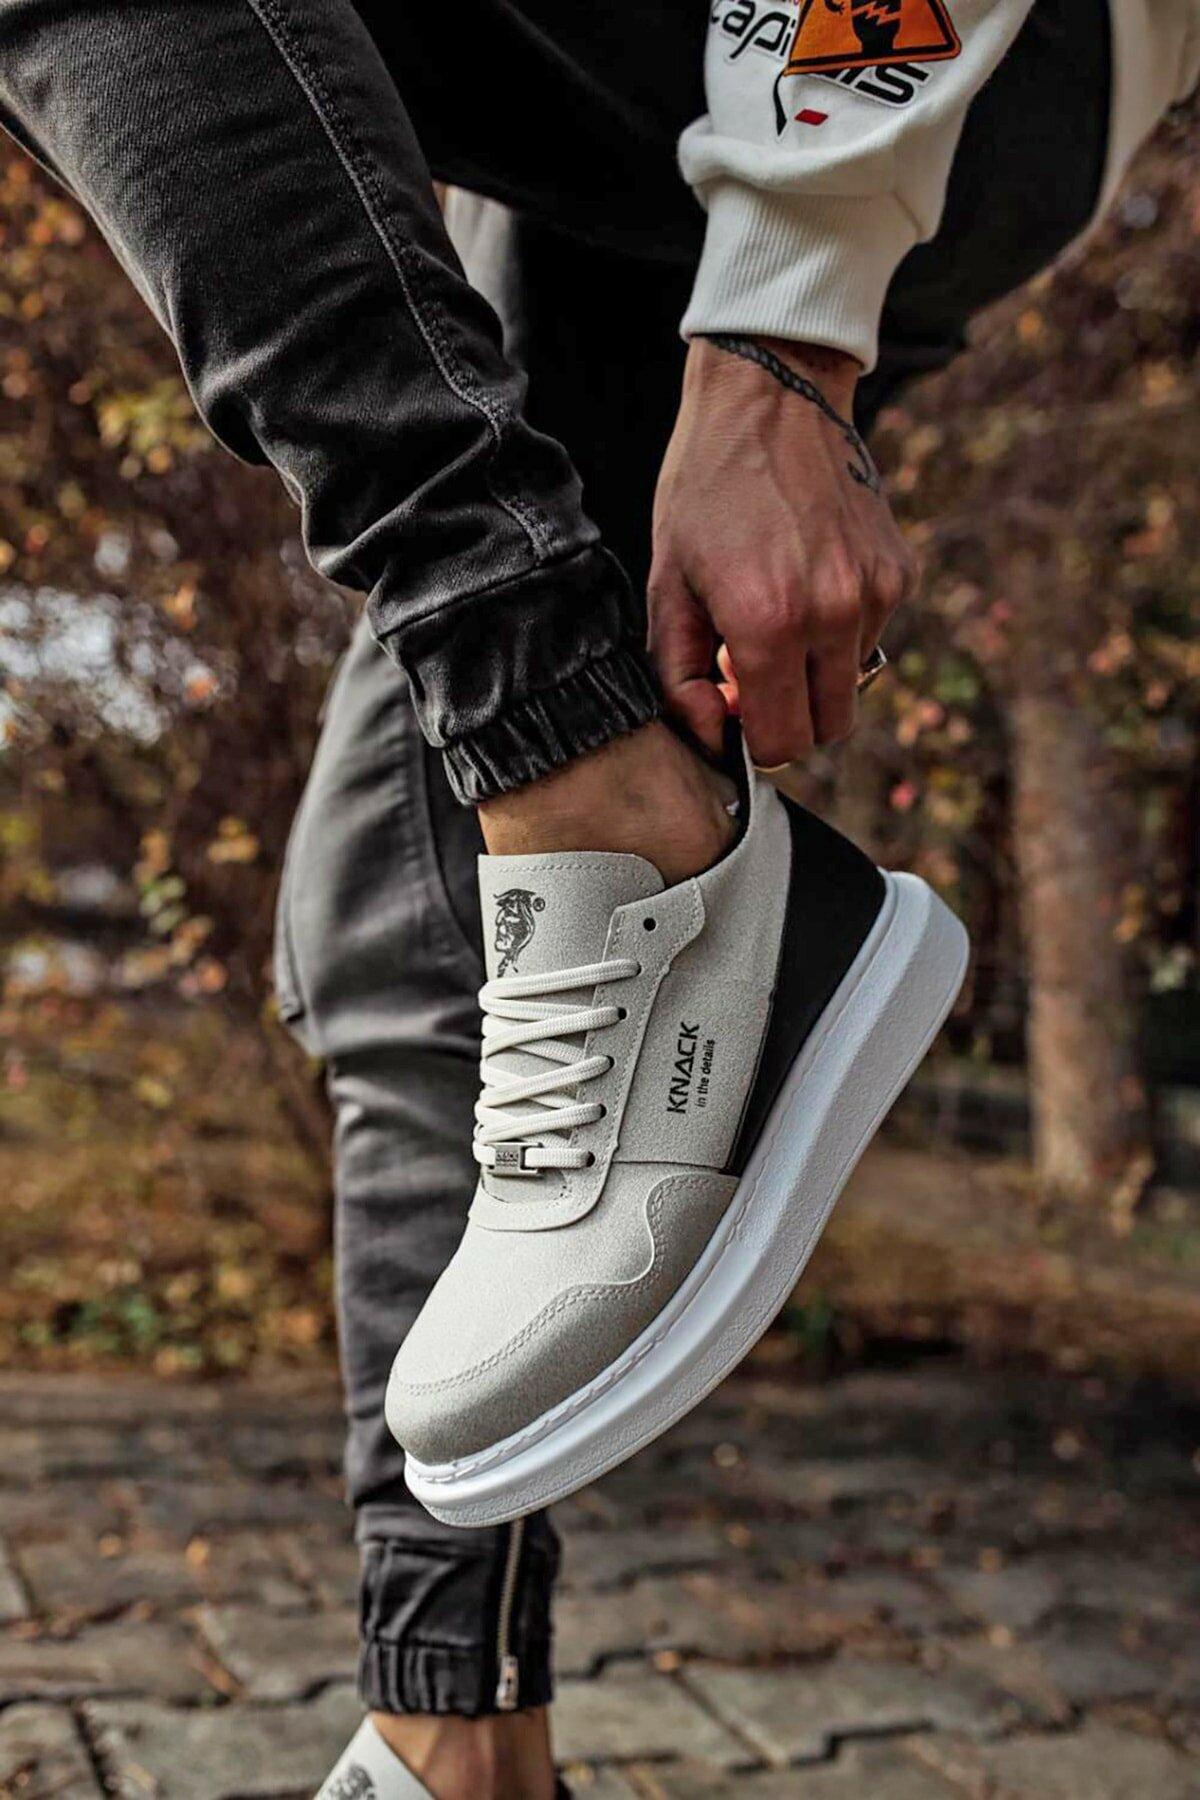 Stepsup مخزن عادية حجر الجلد المدبوغ أحذية رياضية للرجال